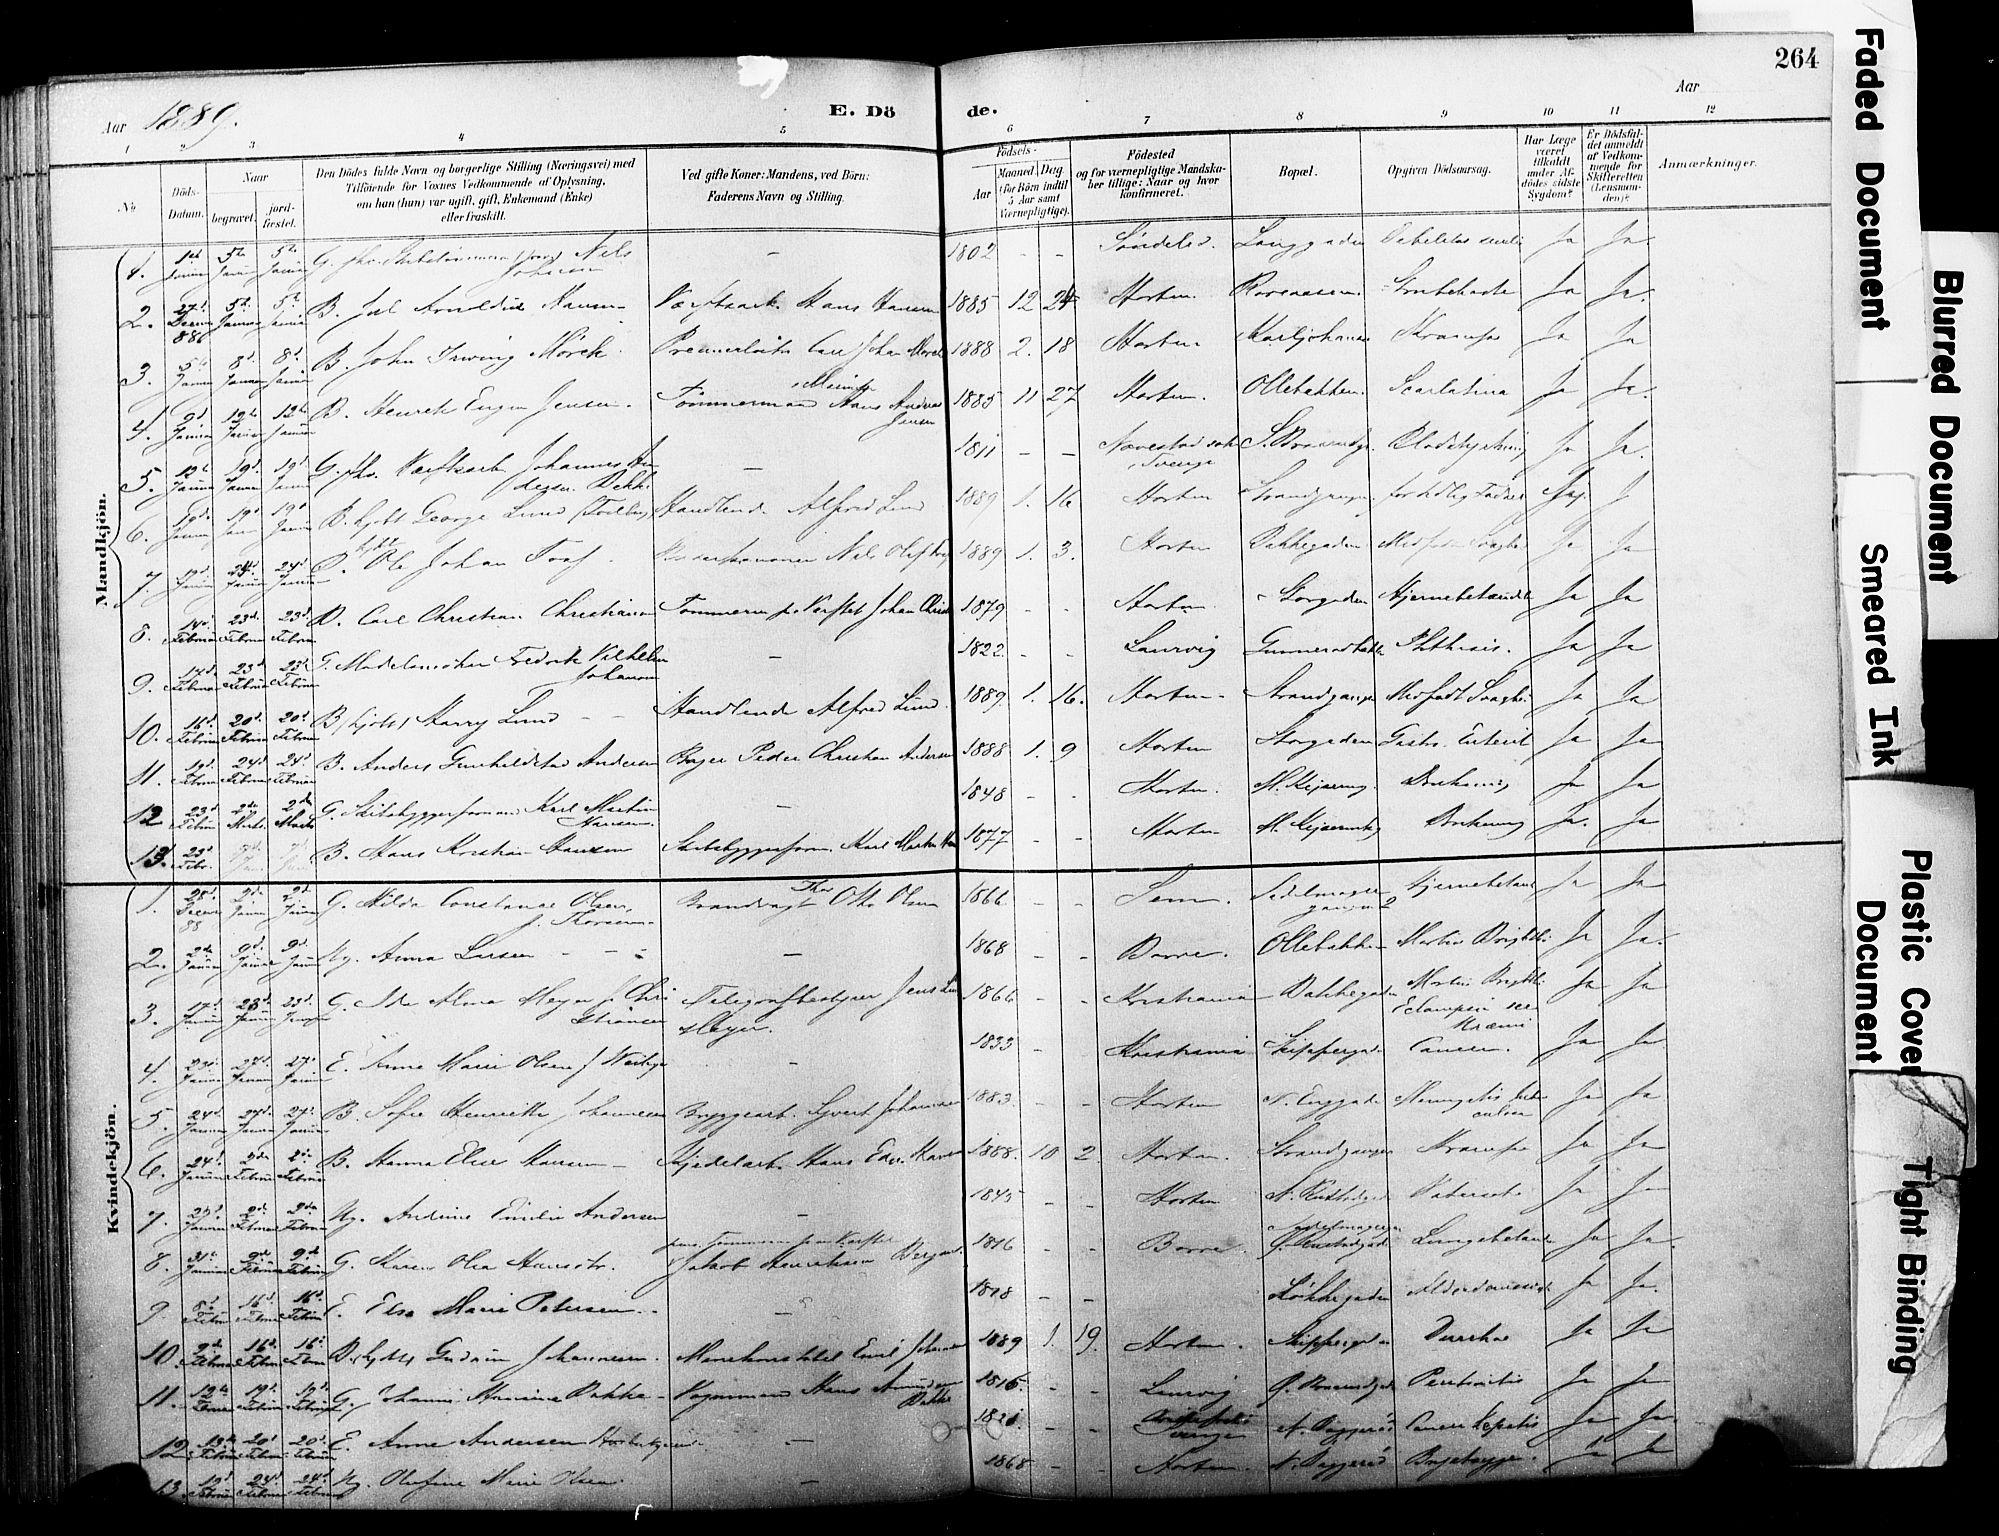 SAKO, Horten kirkebøker, F/Fa/L0004: Parish register (official) no. 4, 1888-1895, p. 264